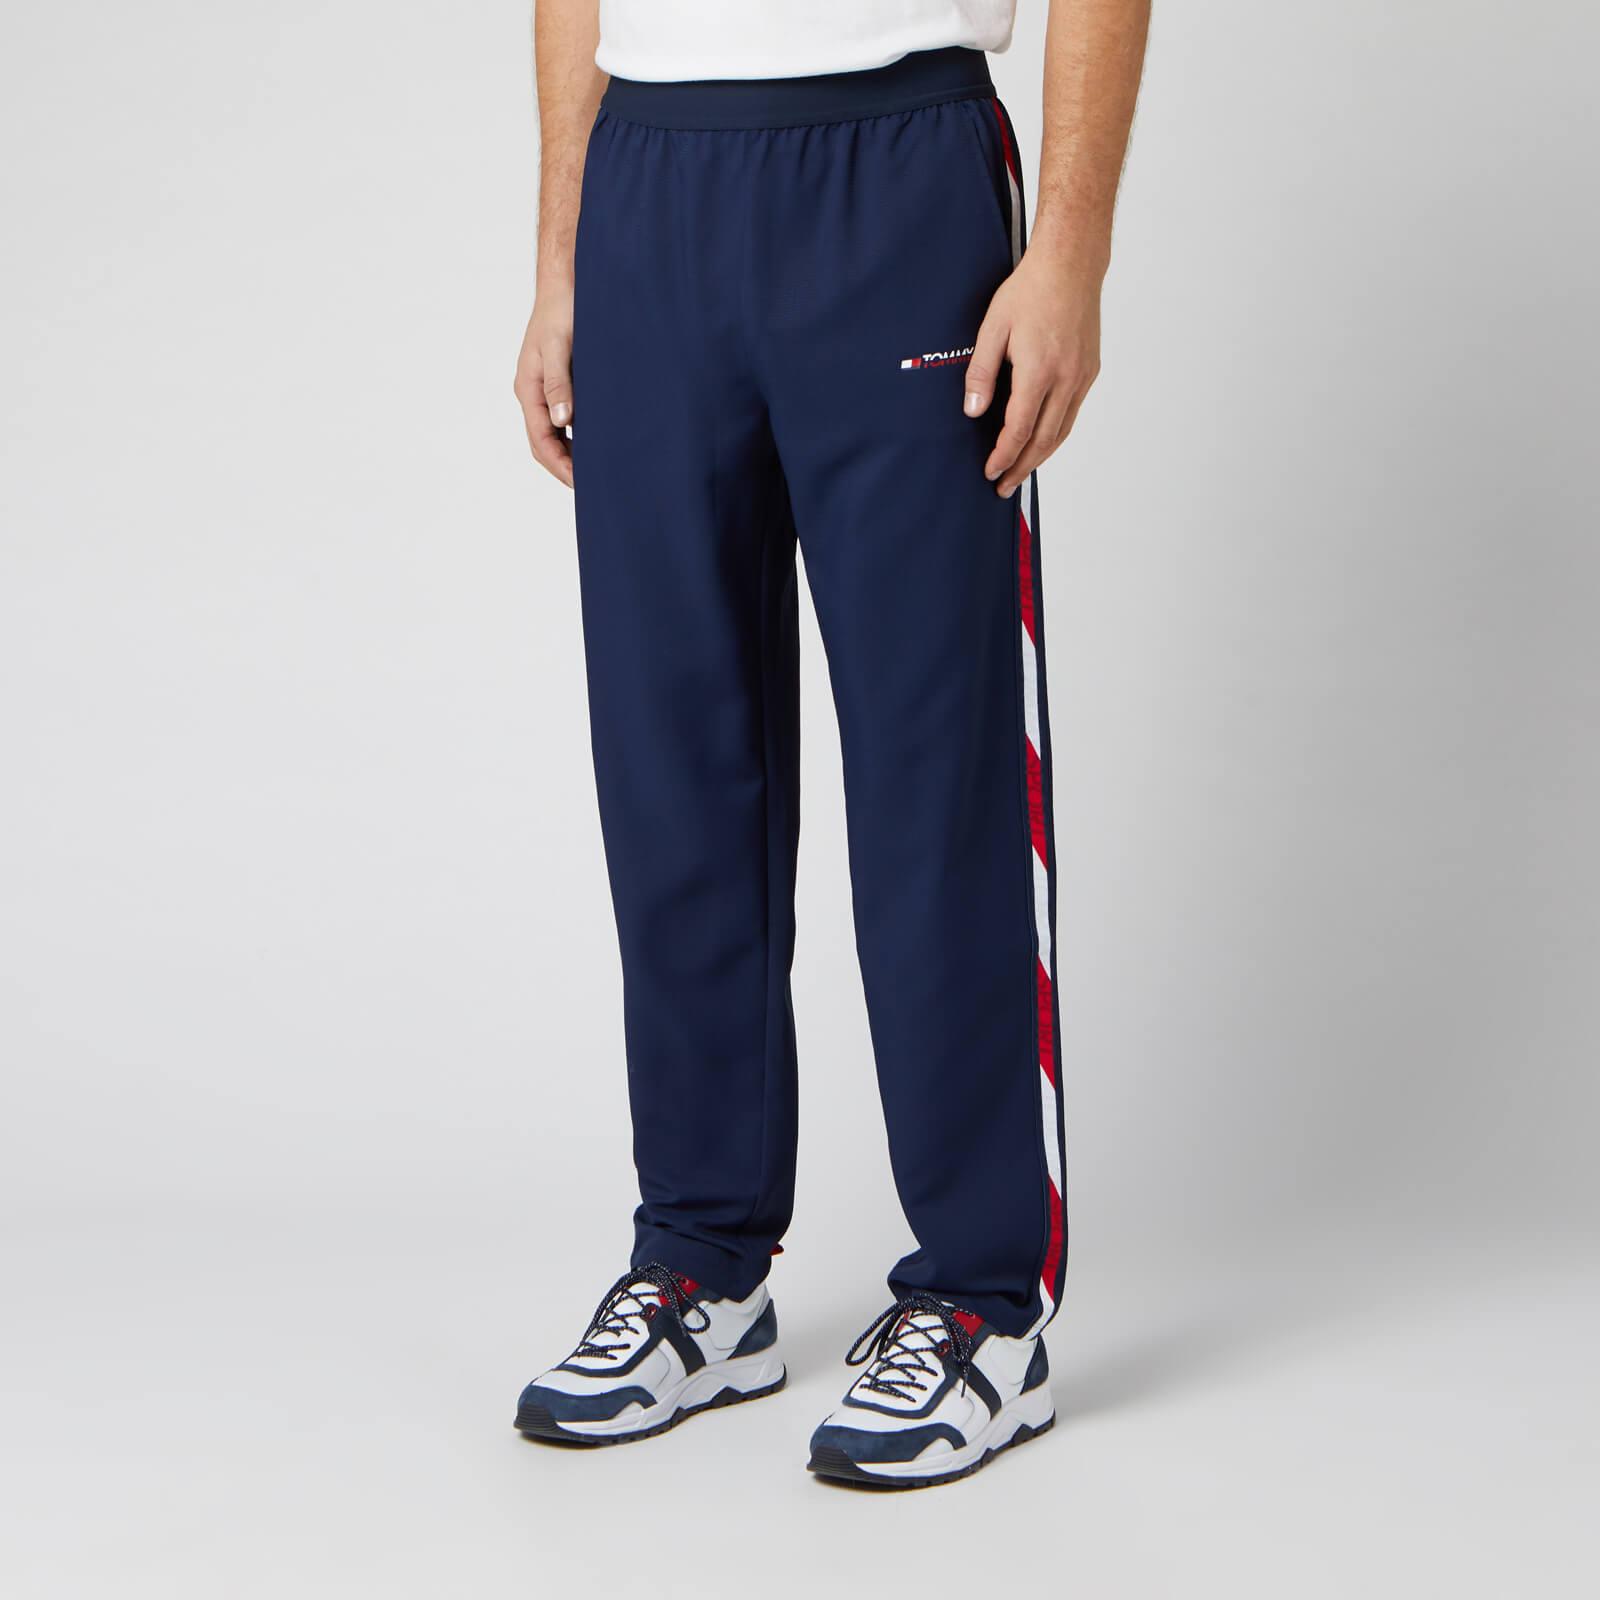 Tommy Hilfiger Sport Men's Woven Tape Pants - Sport Navy - XL